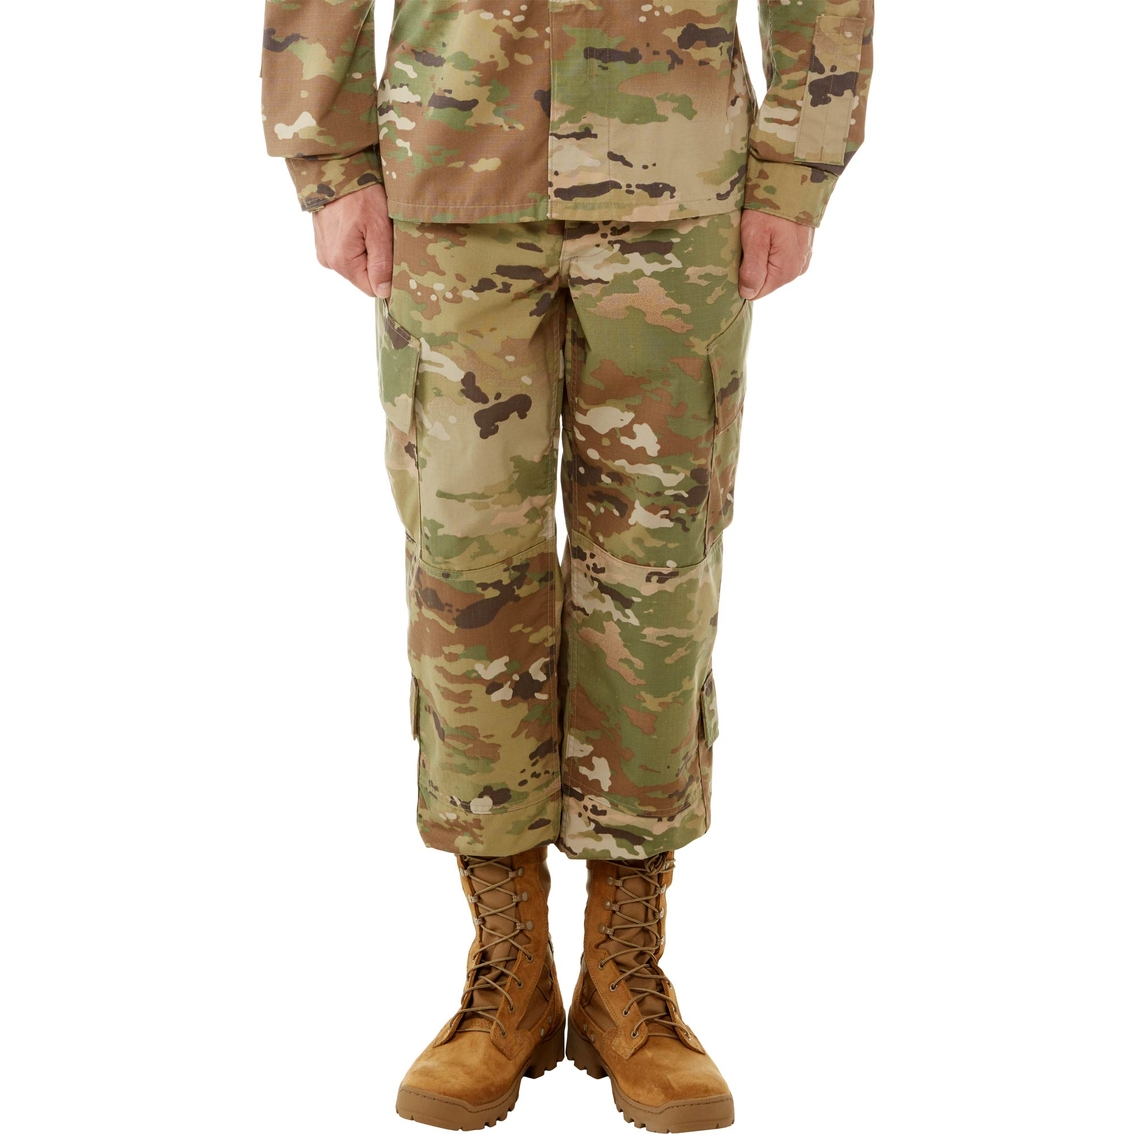 5990085a7b496 Dlats Army Ocp Acu Trousers | Ocp-acu | Military | Shop The Exchange